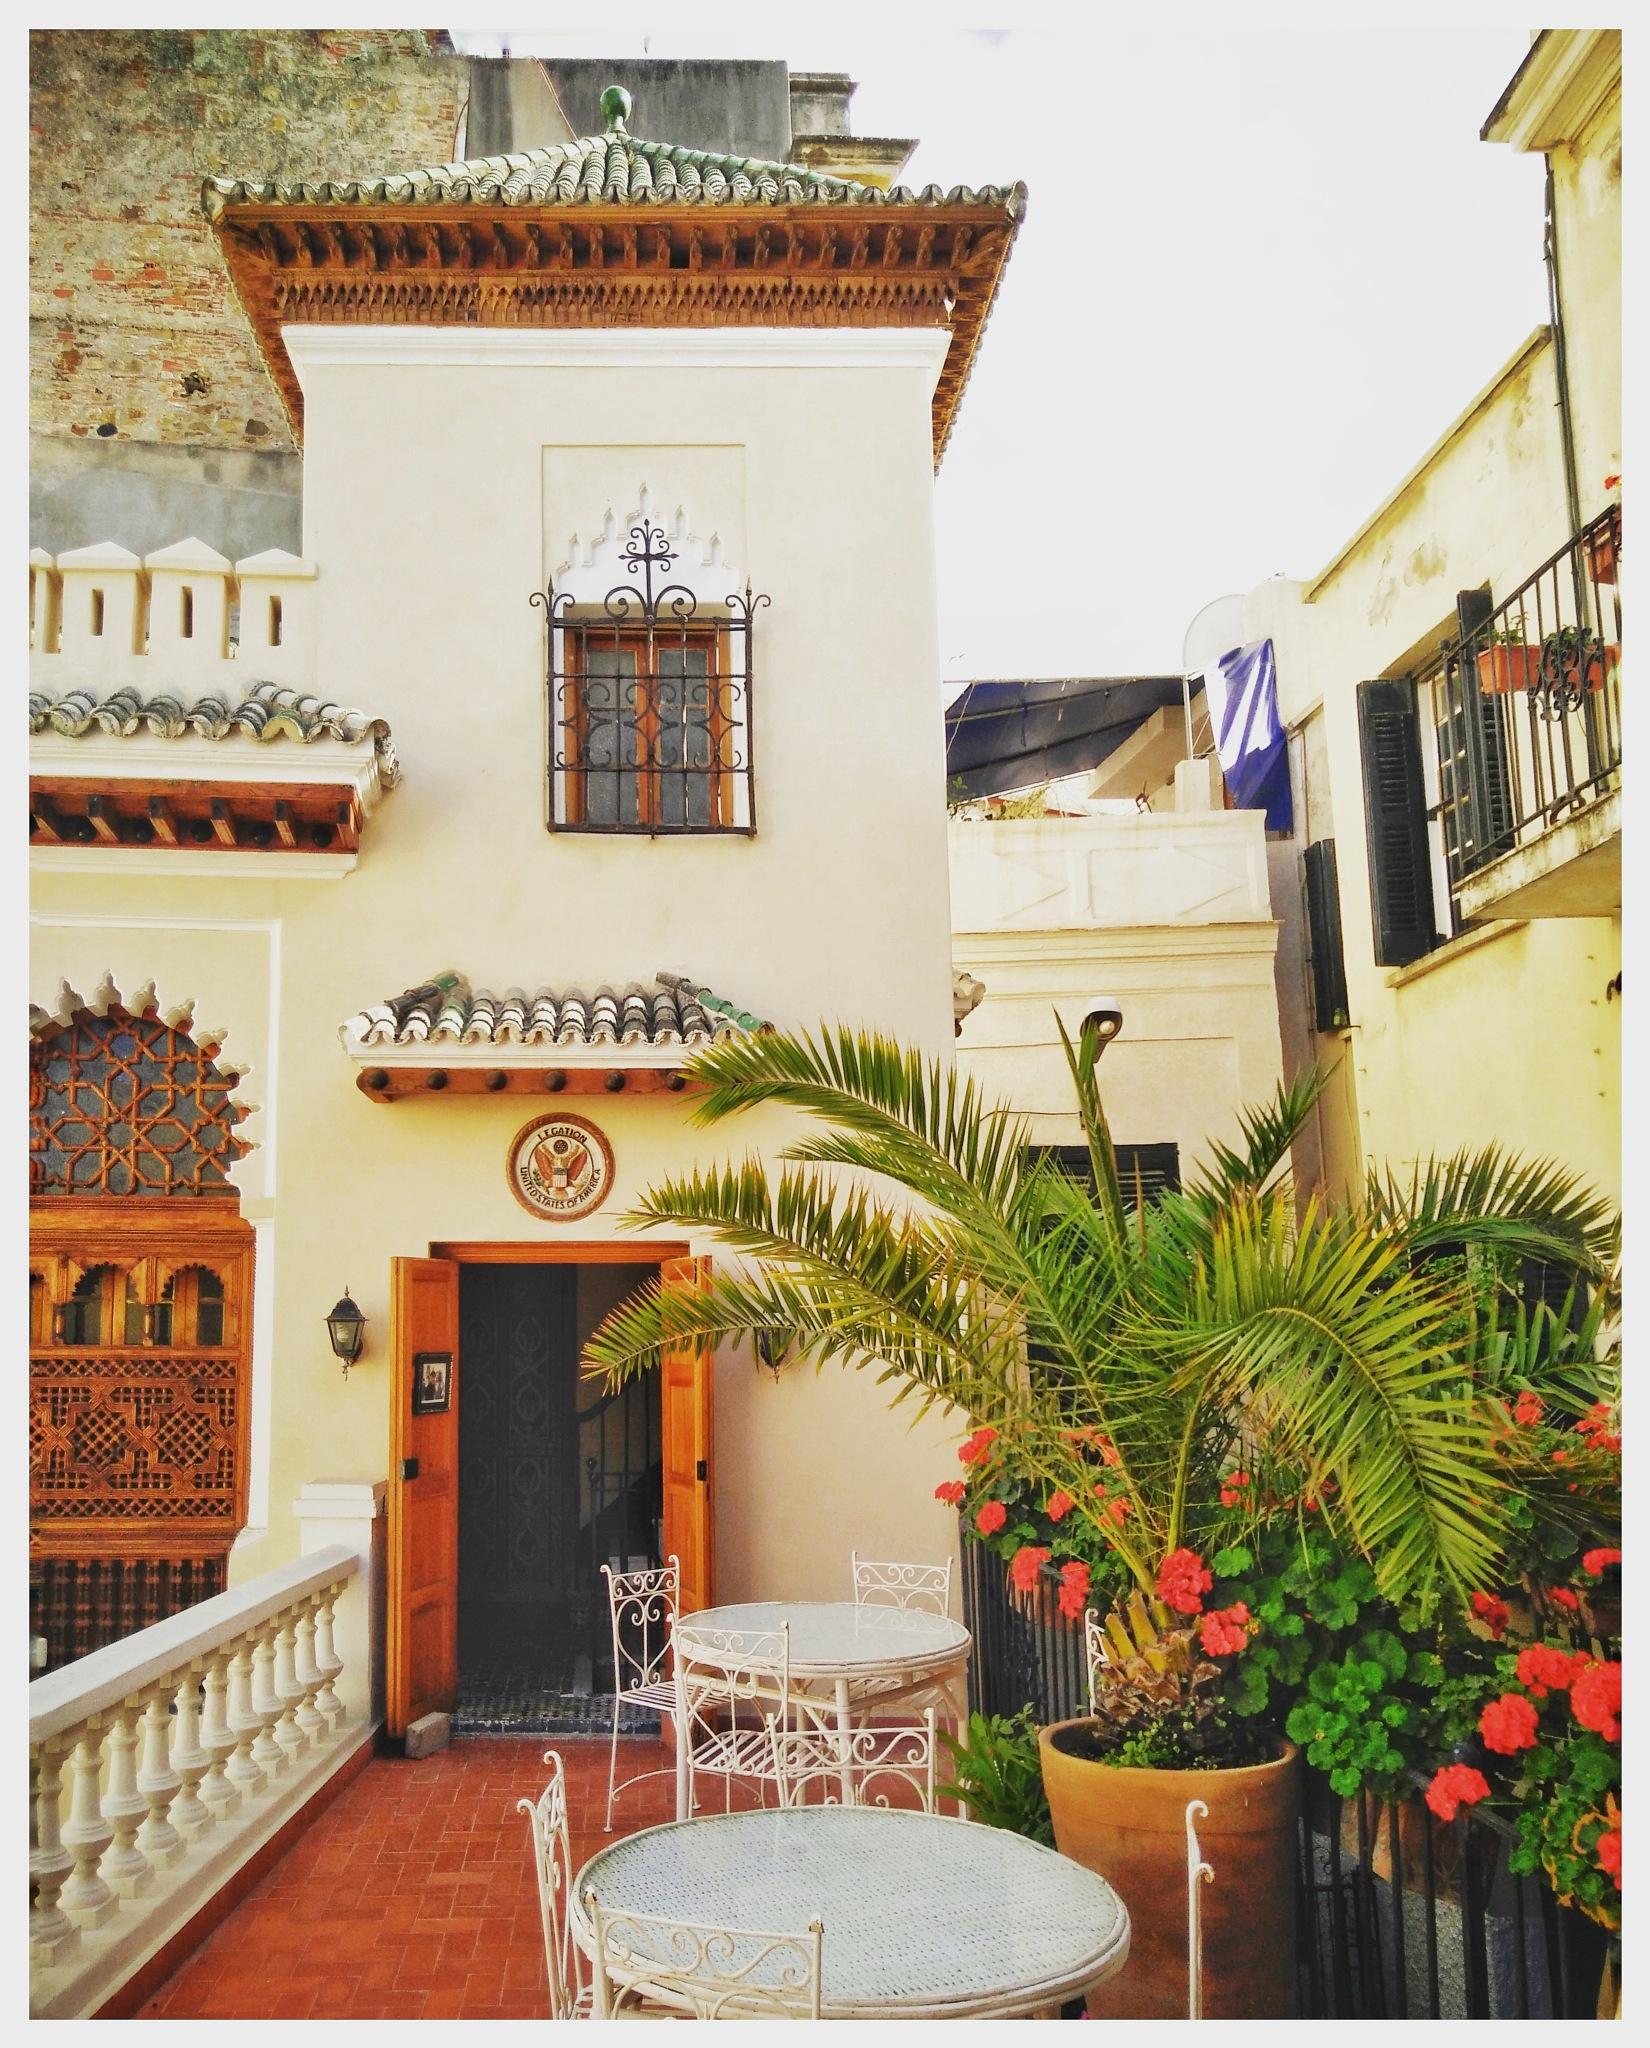 American legation Tanger by aminebensaada